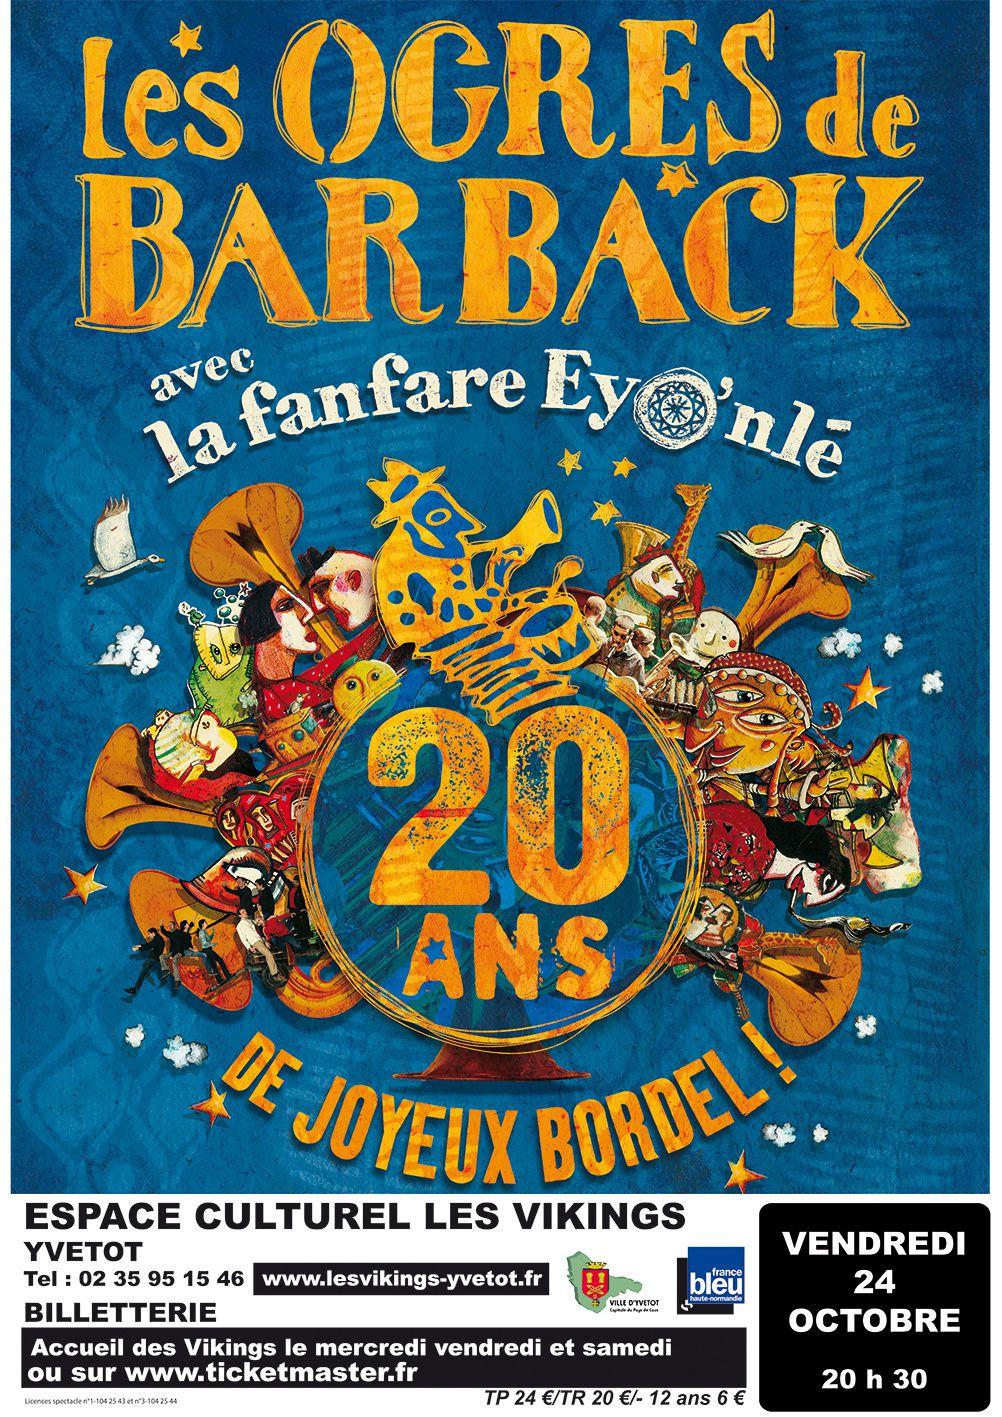 Vendredi 24 octobre à 20h30 Concert «Les Ogres, 20 ans de joyeux bordel» Les Ogres de Barback et la Fanfare Eyo'nlé -Espace culturel Les Vikings à Yvetot